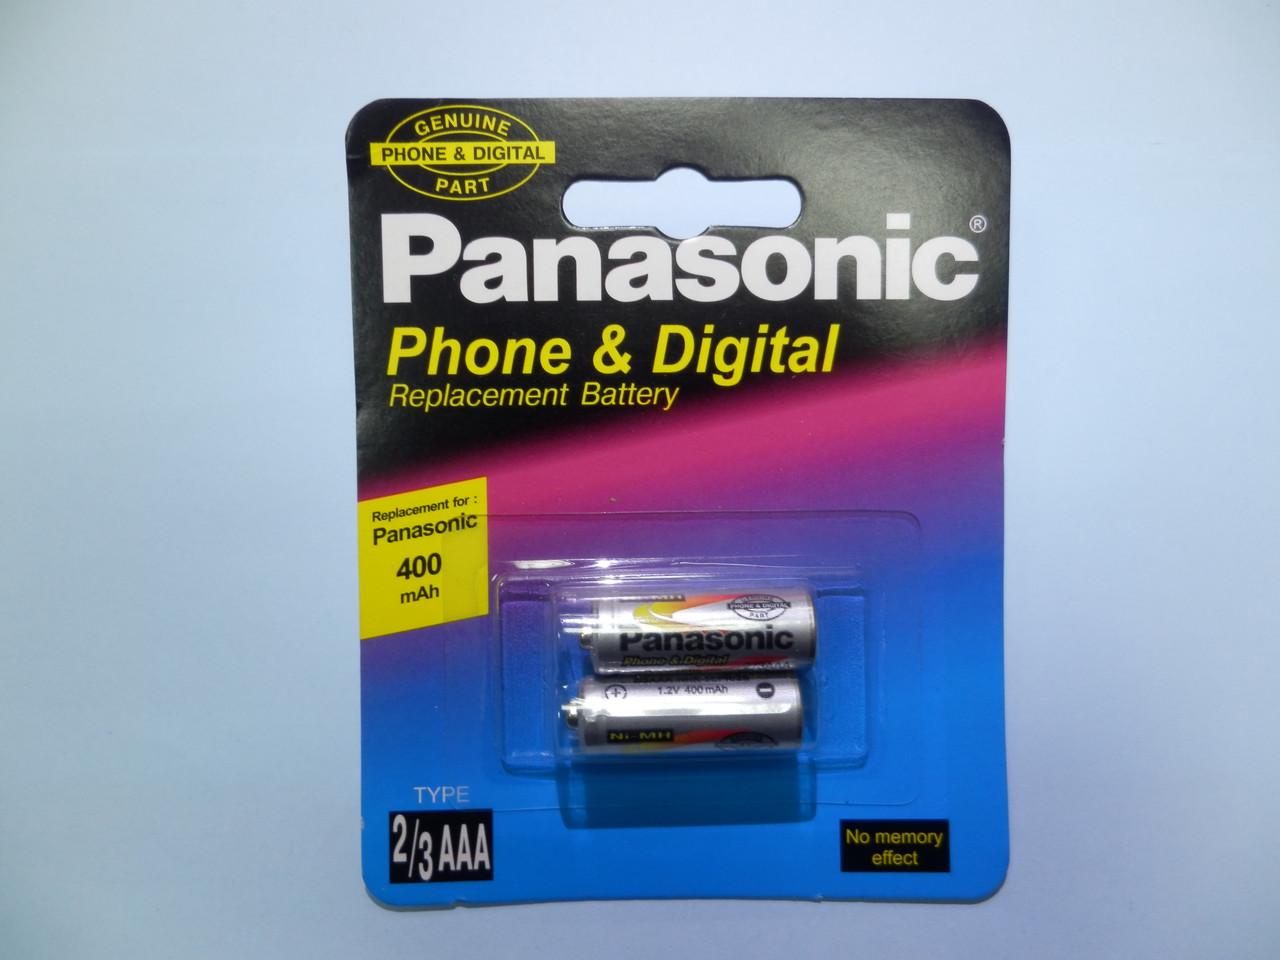 Акумулятор до стаціонарного телефону Panasonic HHR-5EPR ( 1,2 v 400mAh ) (TYPE 2/3AAA)